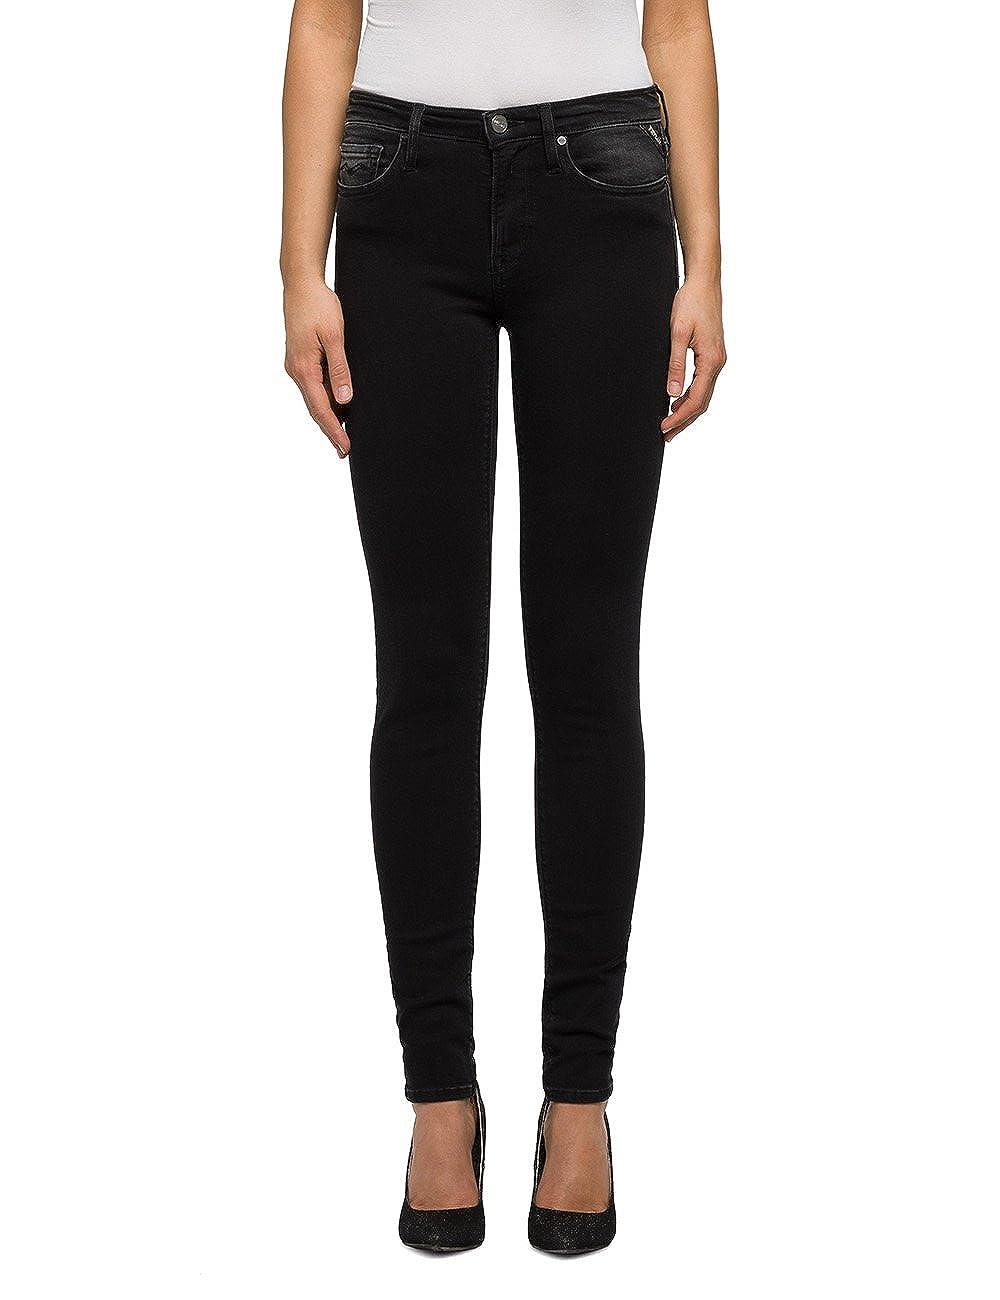 TALLA 29W / 32L. REPLAY Joi, Jeans Ajustados para Mujer